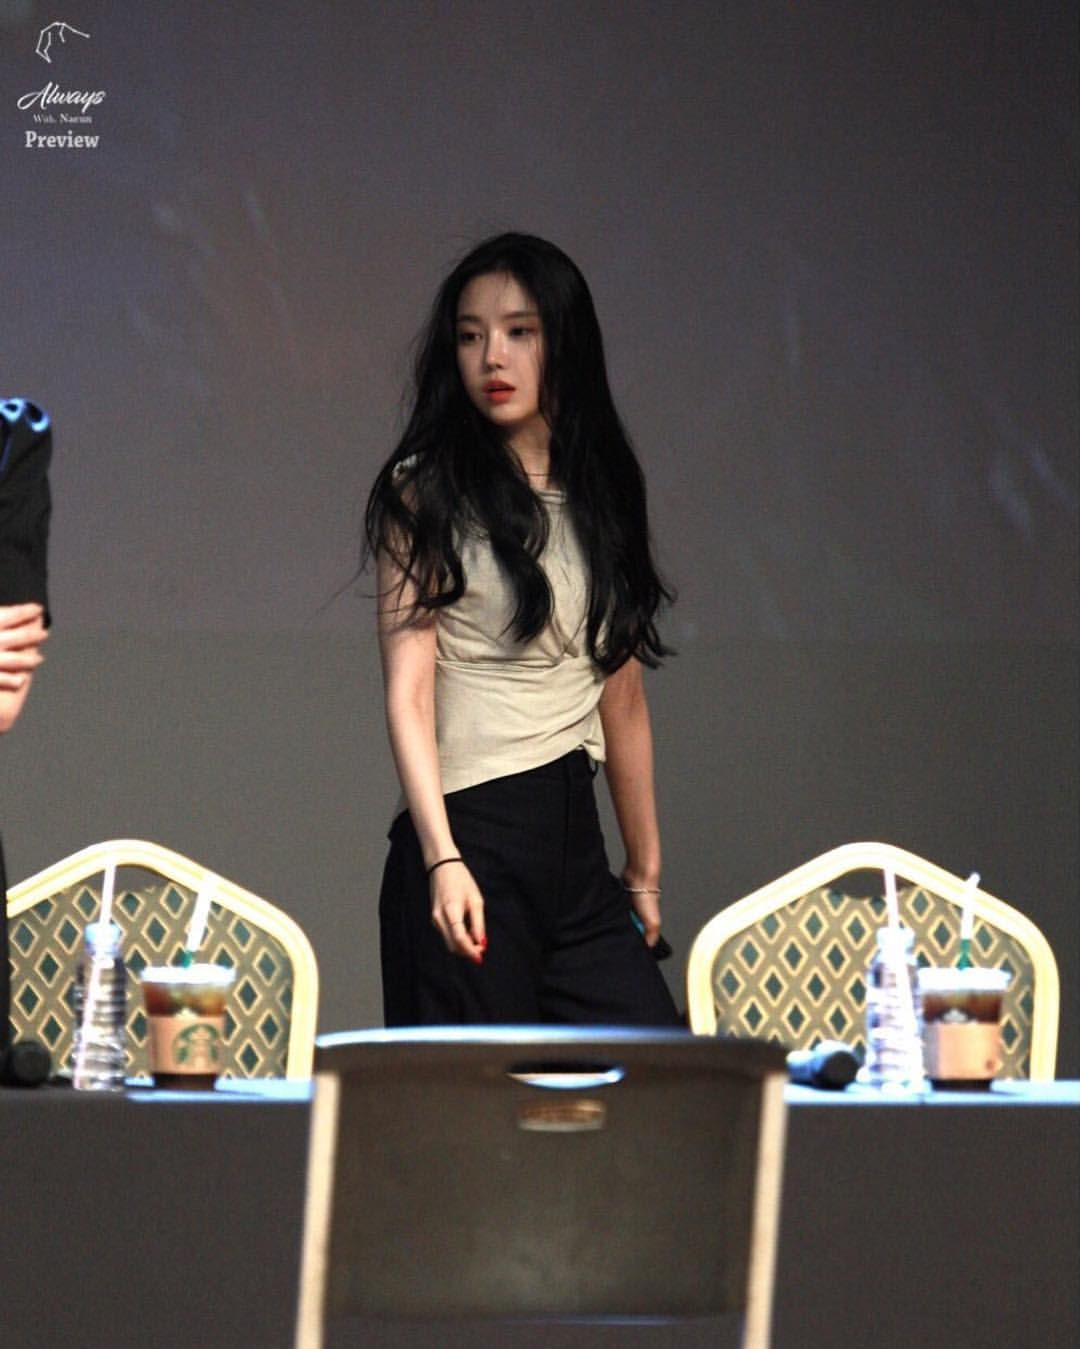 Pin by Sami on Apink naeun in 2020 | Cute korean girl ...